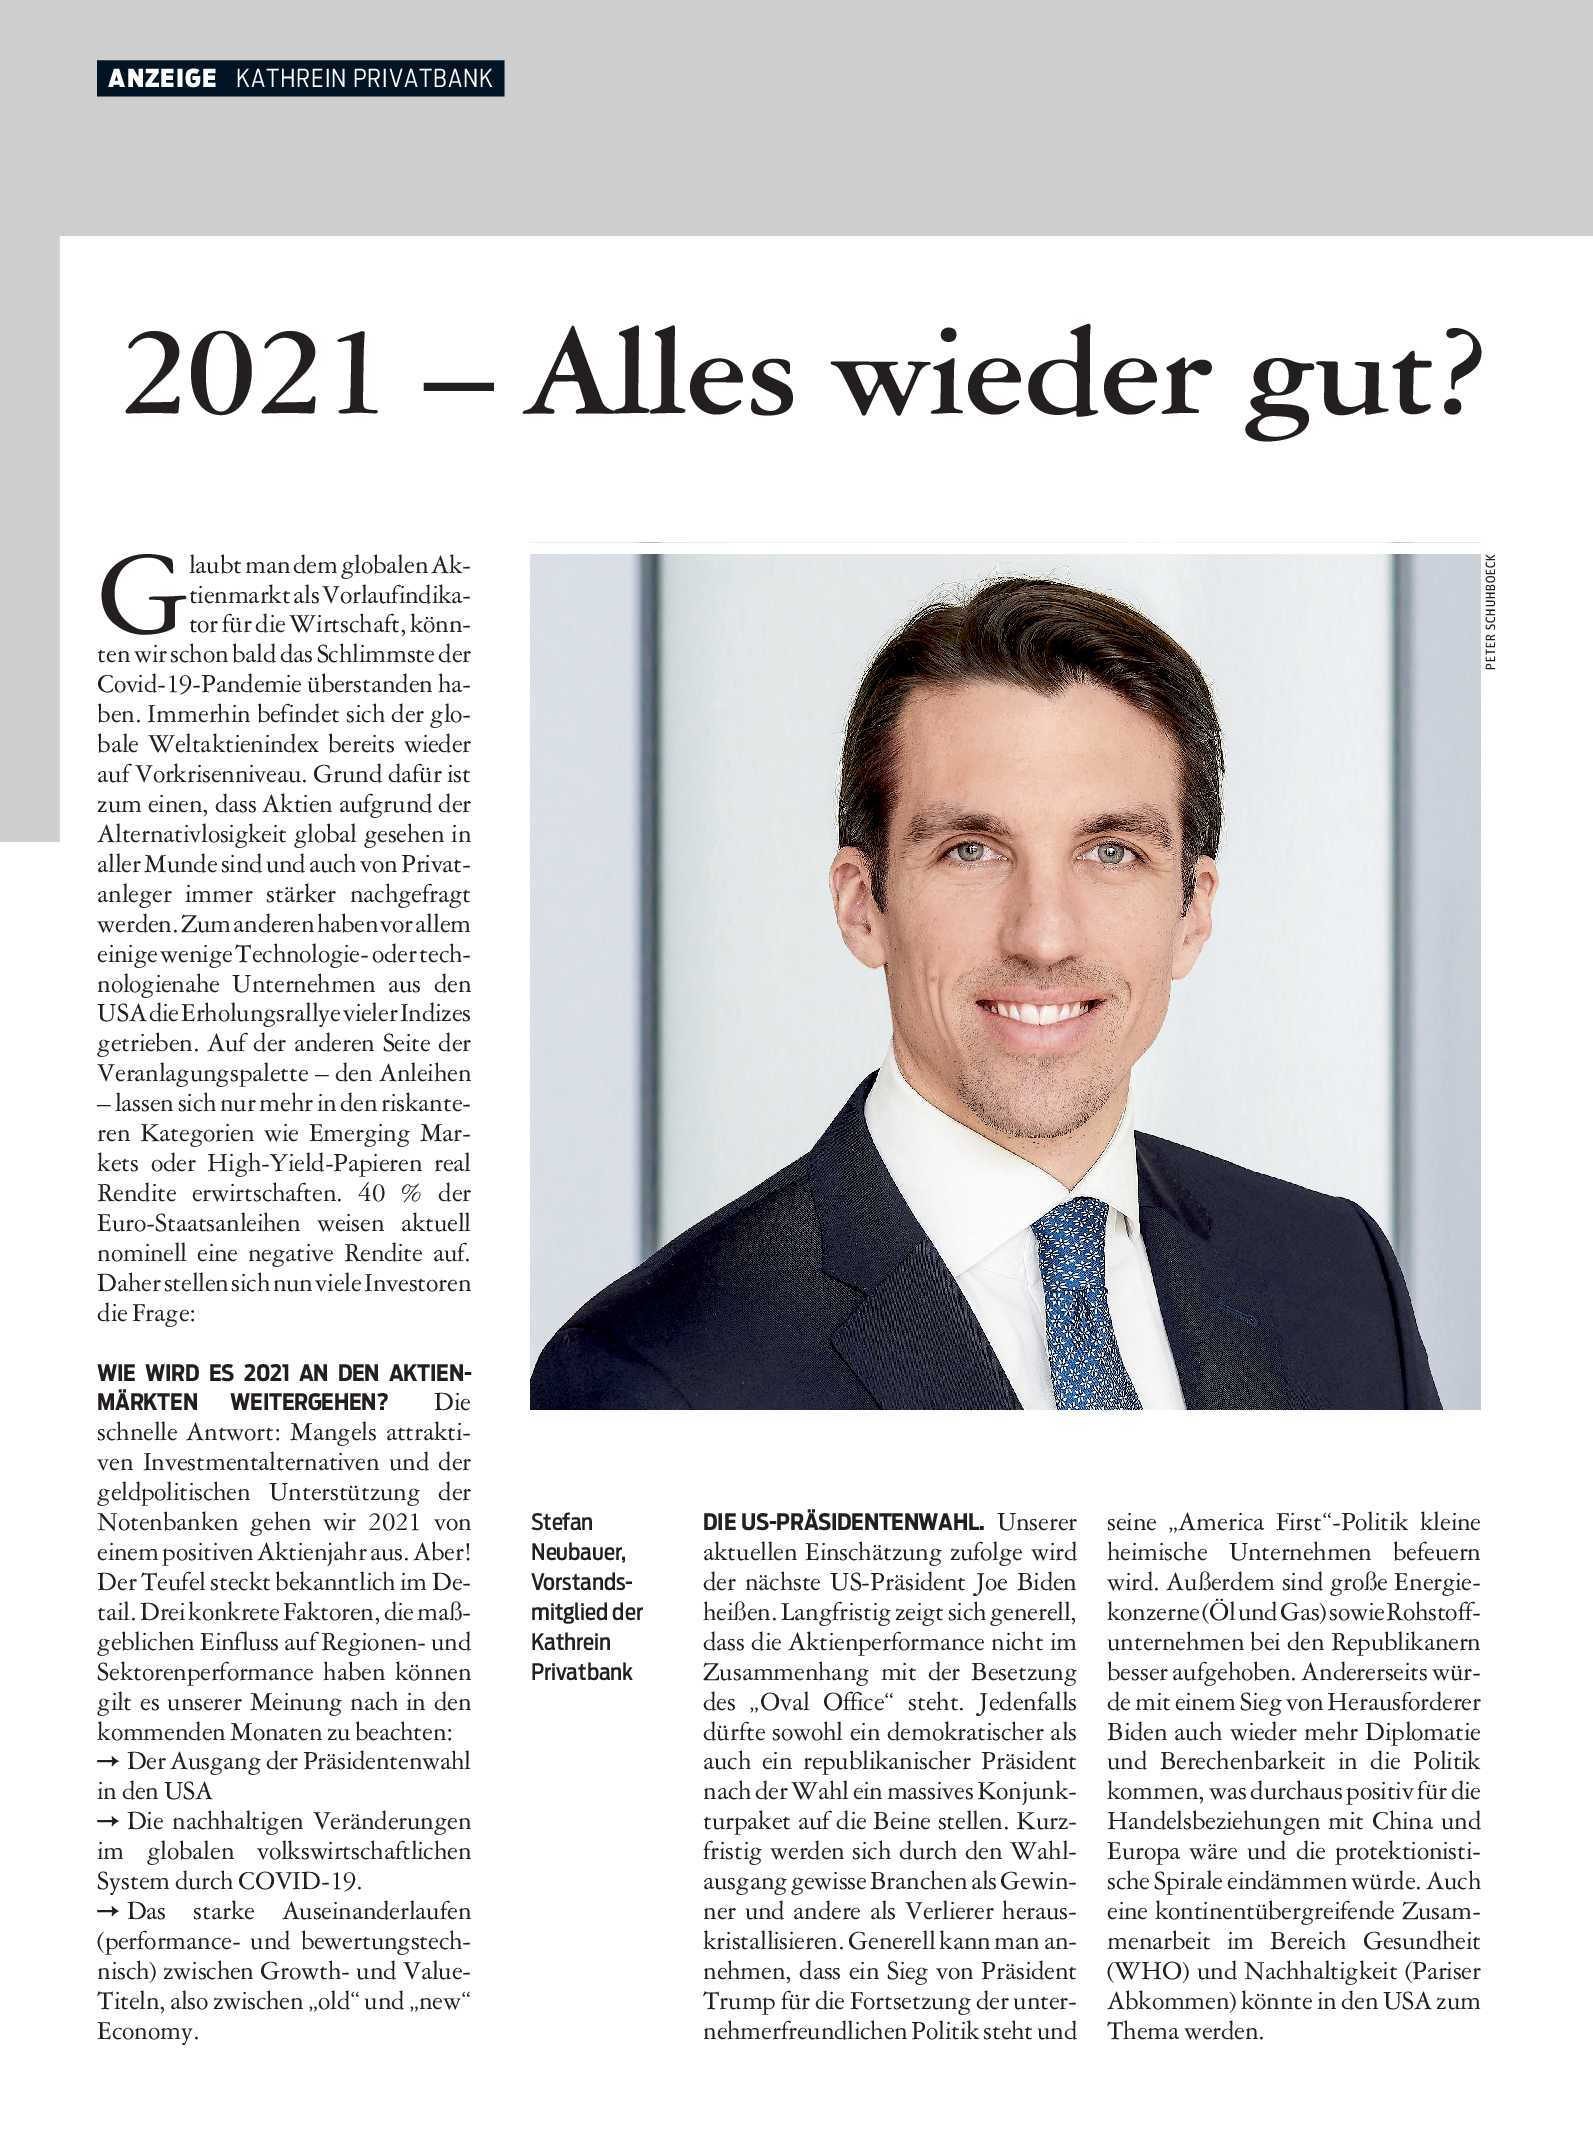 public/epaper/imported/20201118/kurier/magazin/magazin_20201118_036.jpg